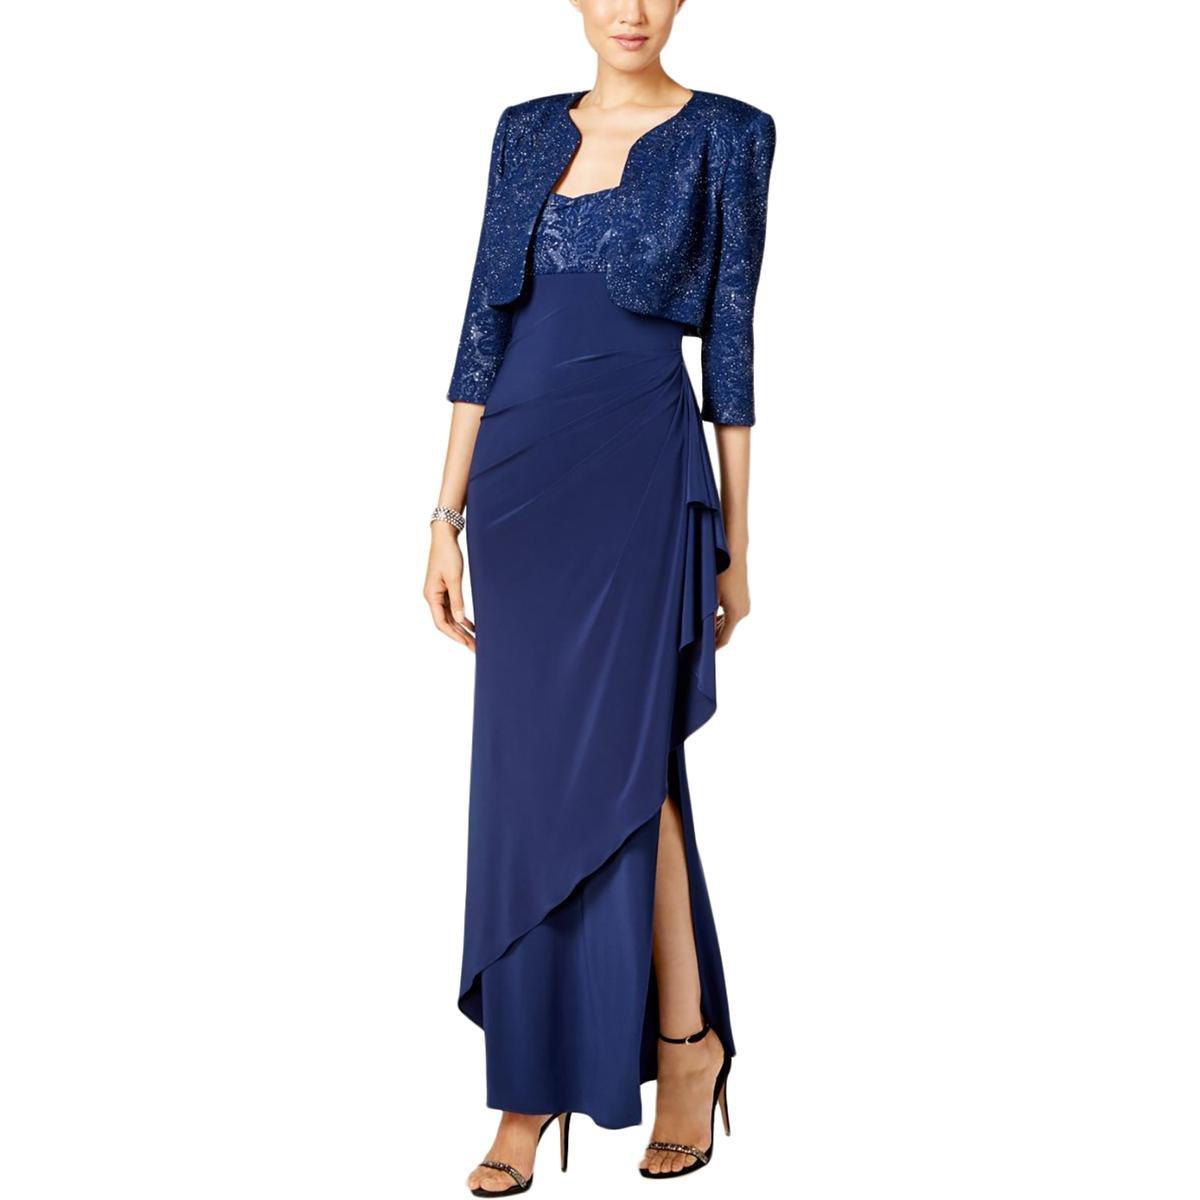 c303d3fa8384e Alex Evenings Womens Petites Beaded Sleeveless Dress with Jacket - Blue -  20 Petite: Amazon.co.uk: Clothing